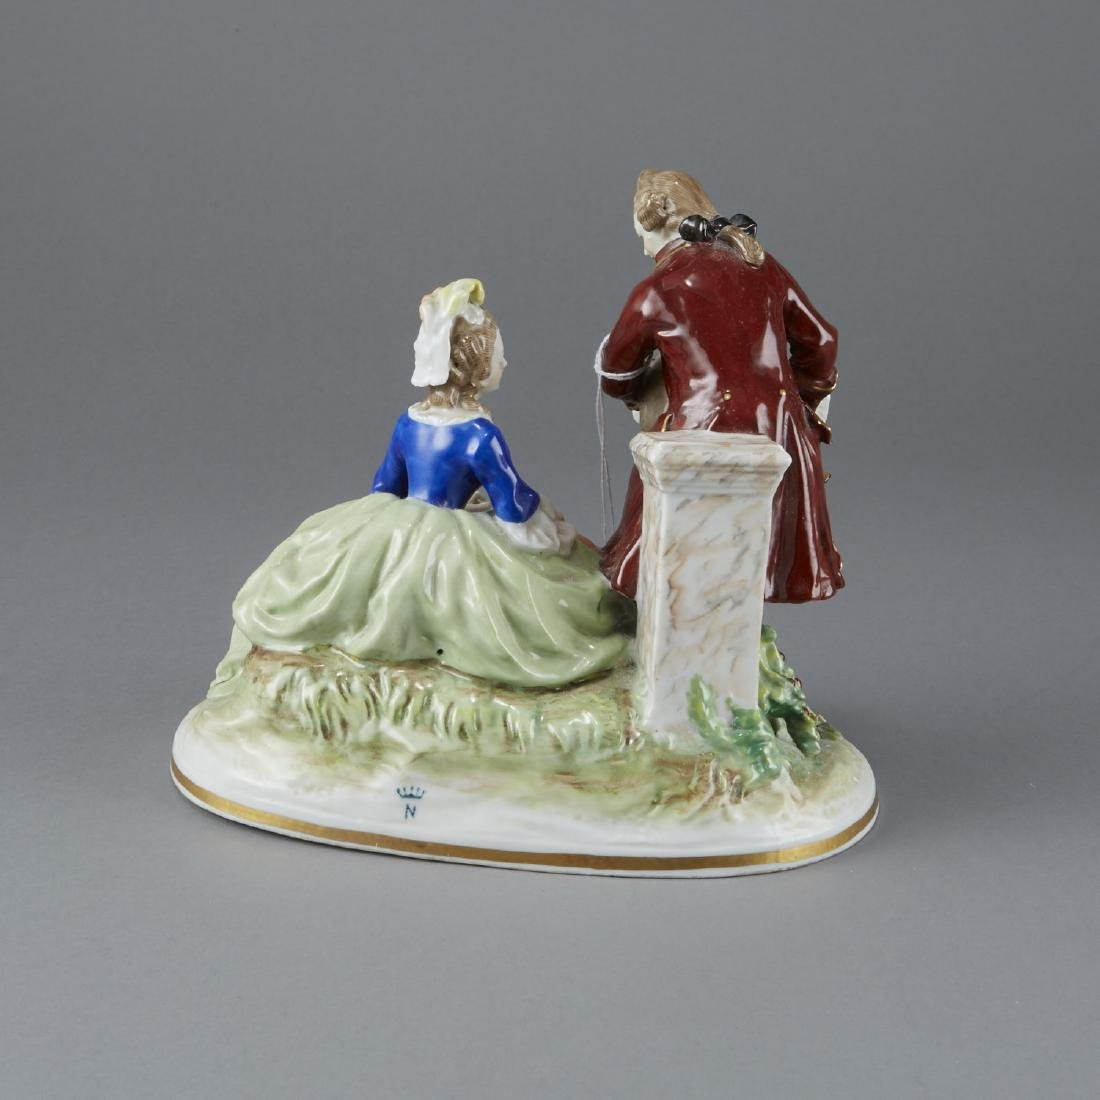 Capodimonte Figural Porcelain Group - 2